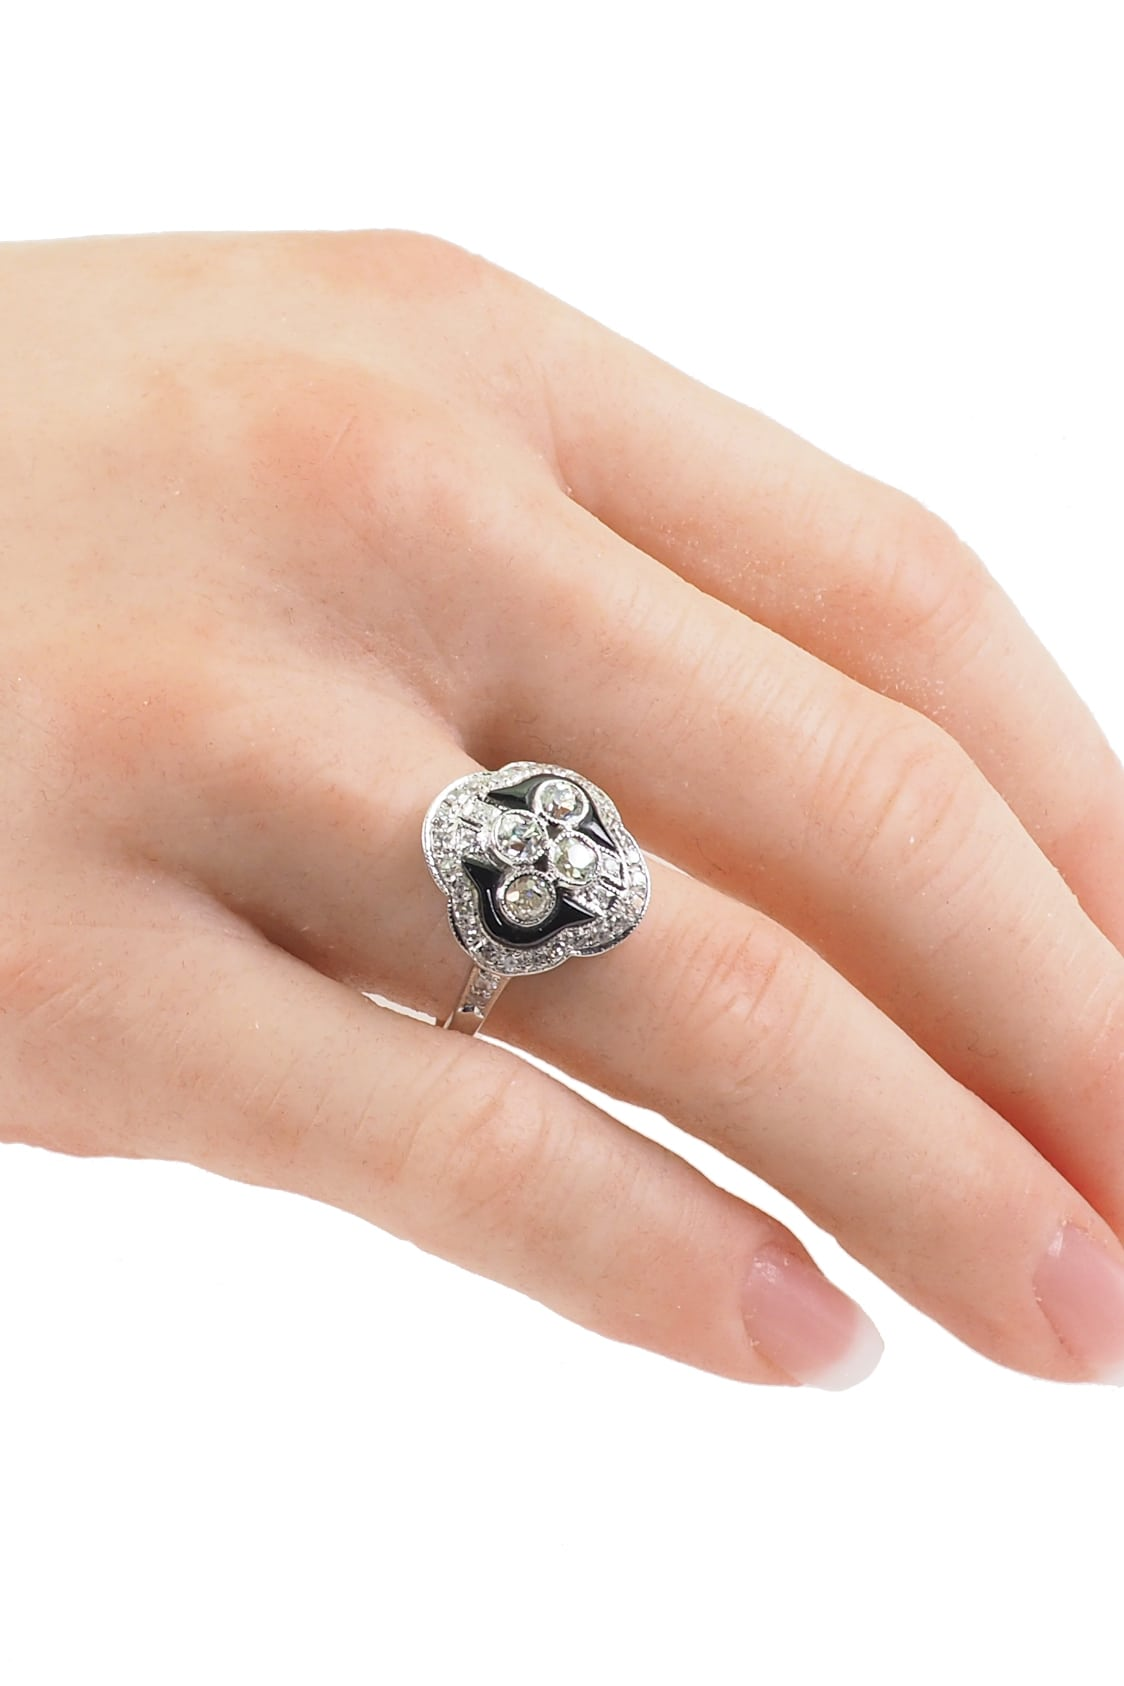 antikschmuck-ring-1344h